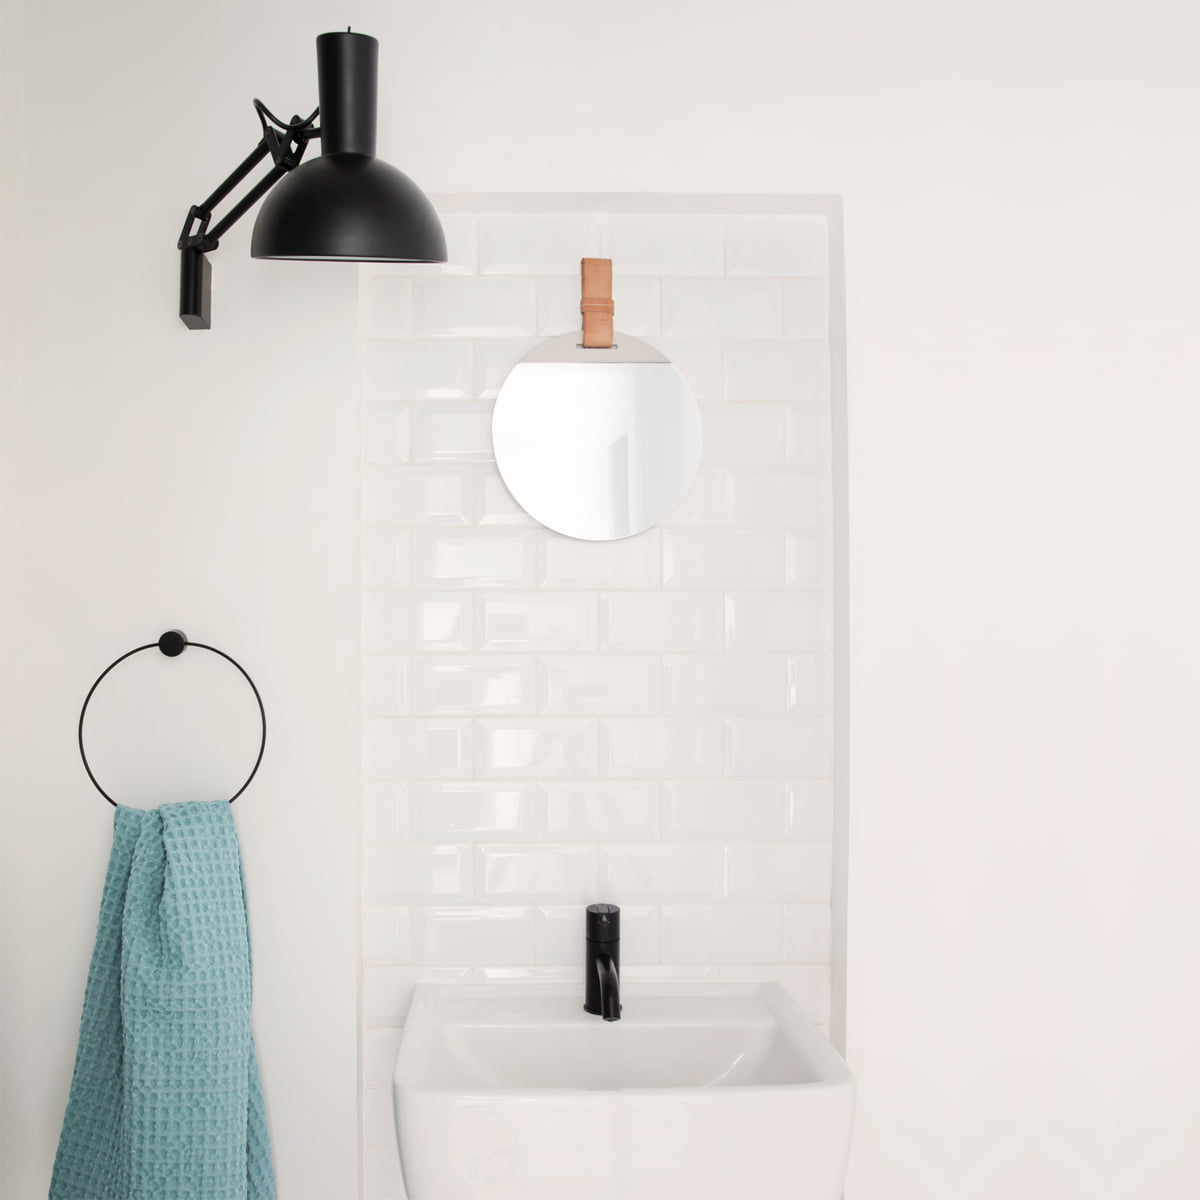 enter spiegel von ferm living connox shop. Black Bedroom Furniture Sets. Home Design Ideas